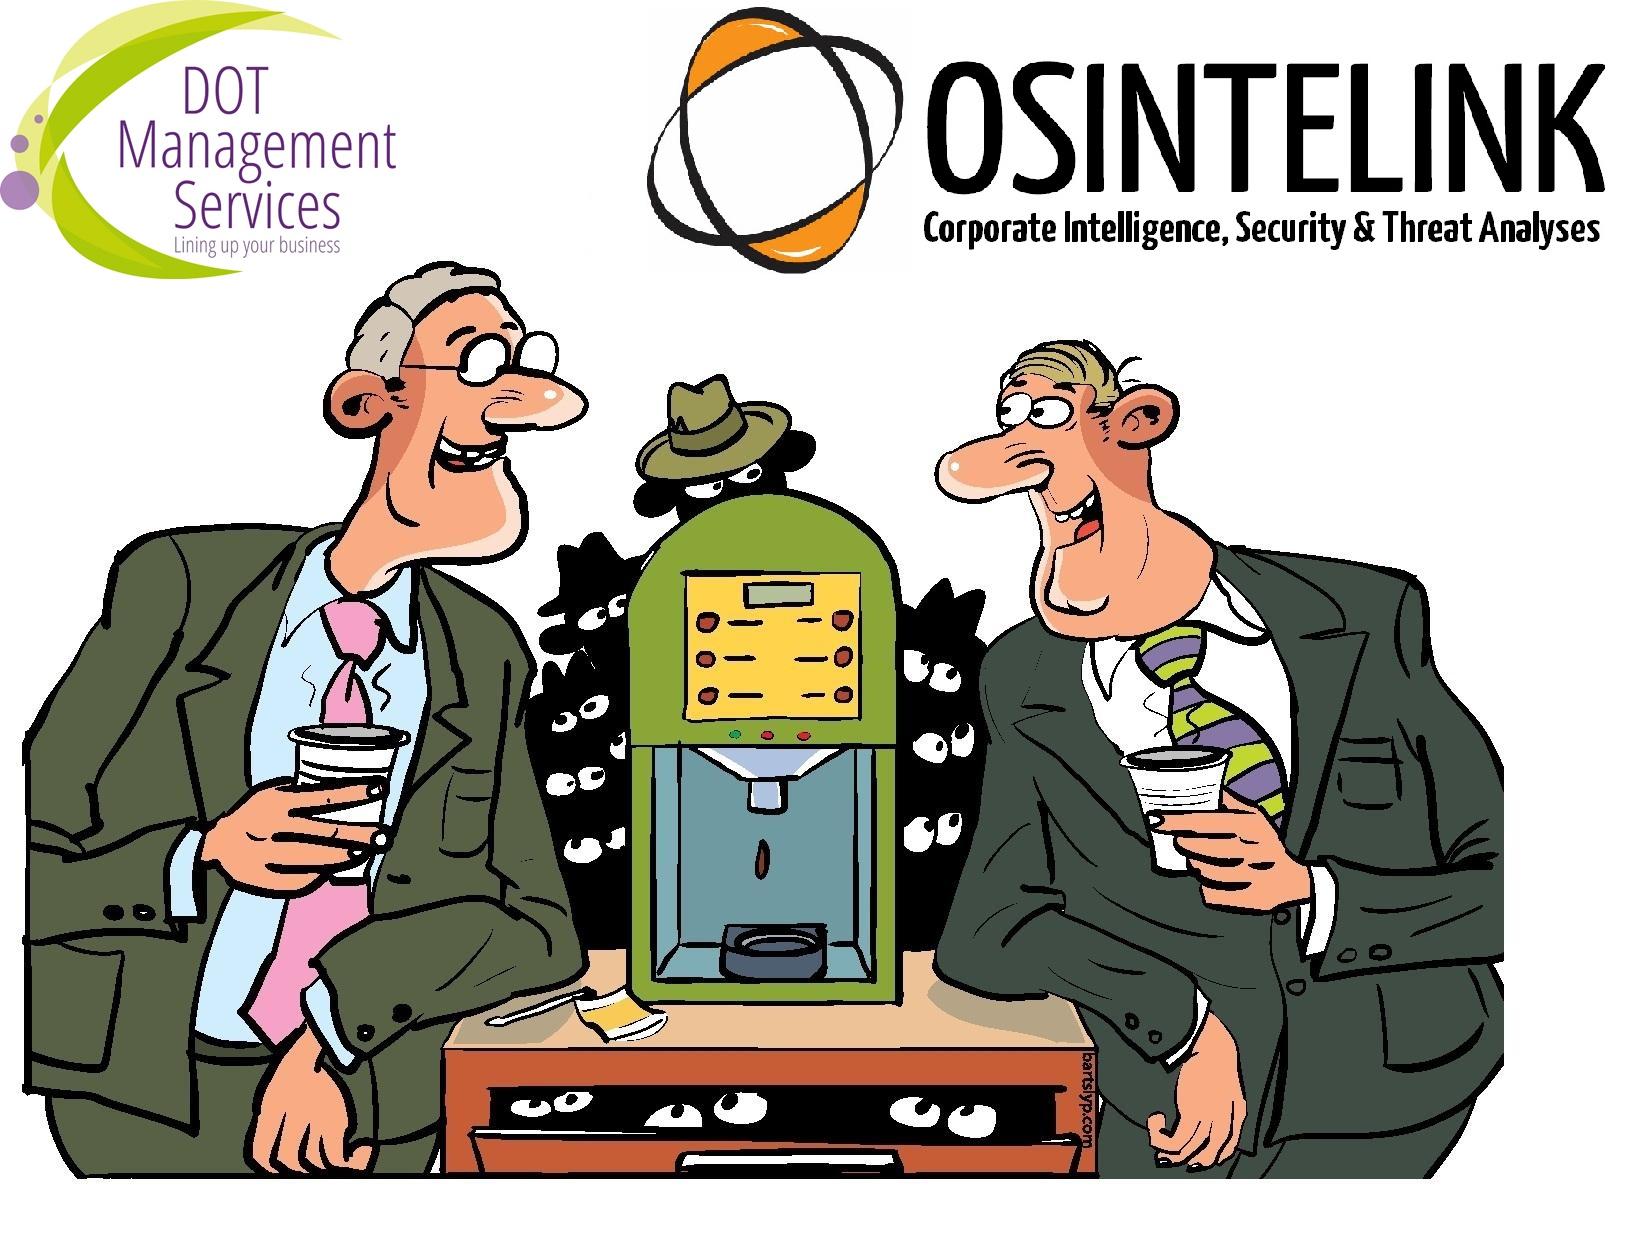 poster-osintelink-dot